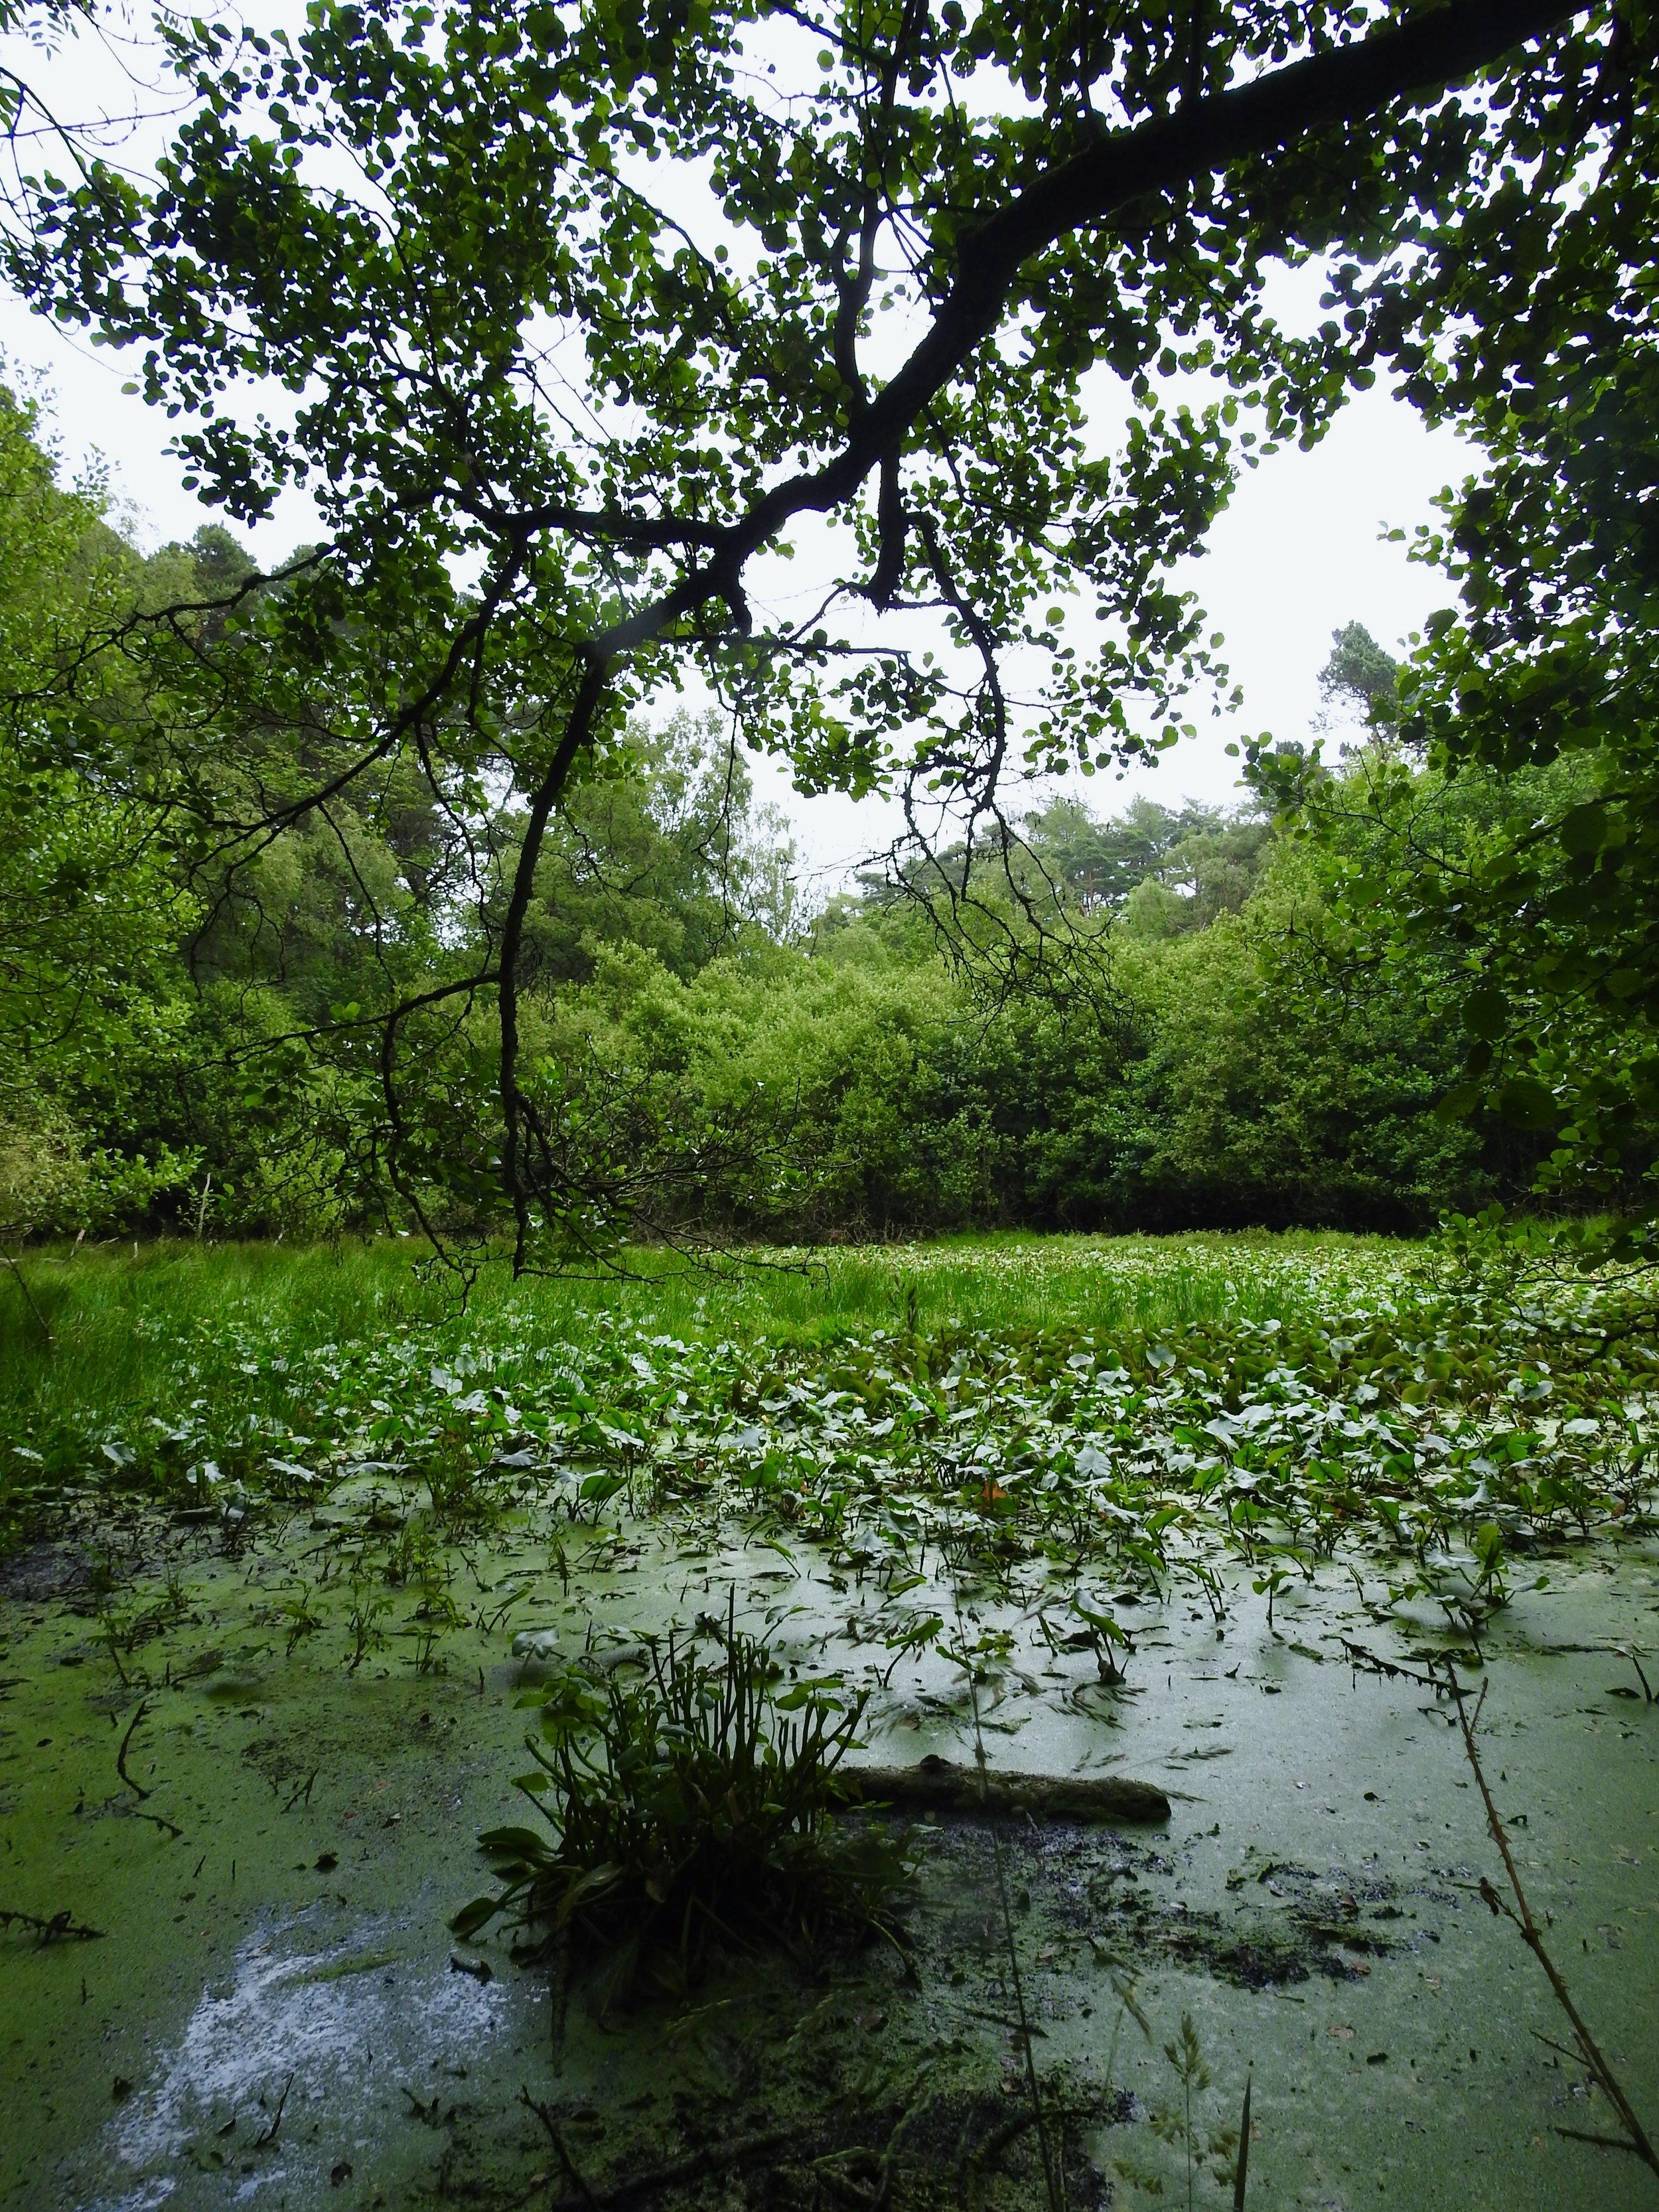 The enclosure pond